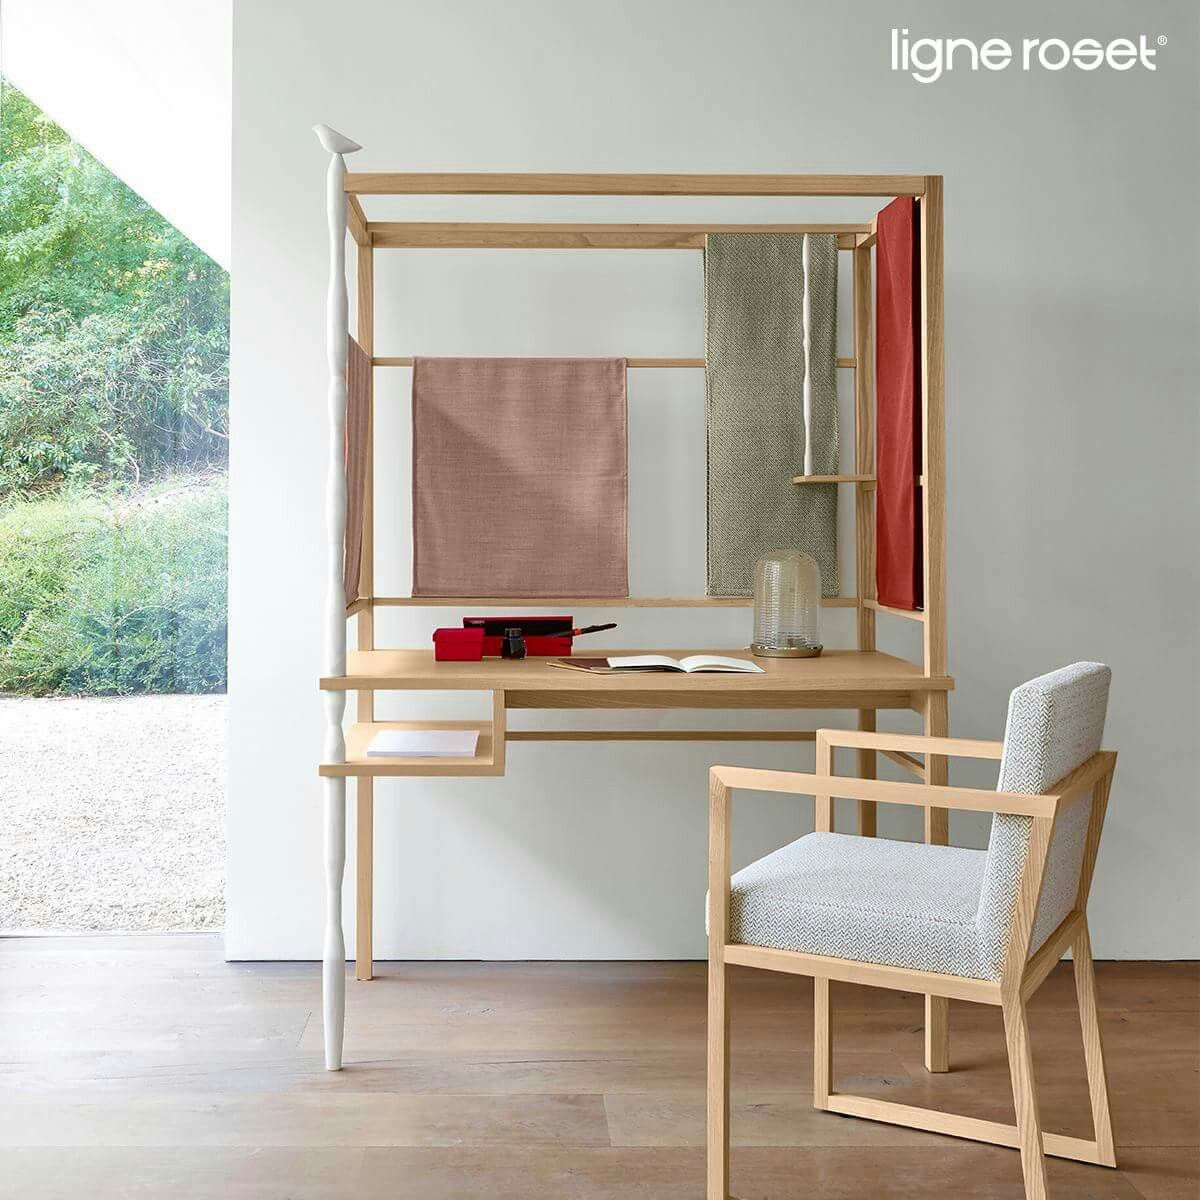 ligne roset meuble tv simple ordinaire ligne roset meuble tv dco pour with ligne roset meuble. Black Bedroom Furniture Sets. Home Design Ideas